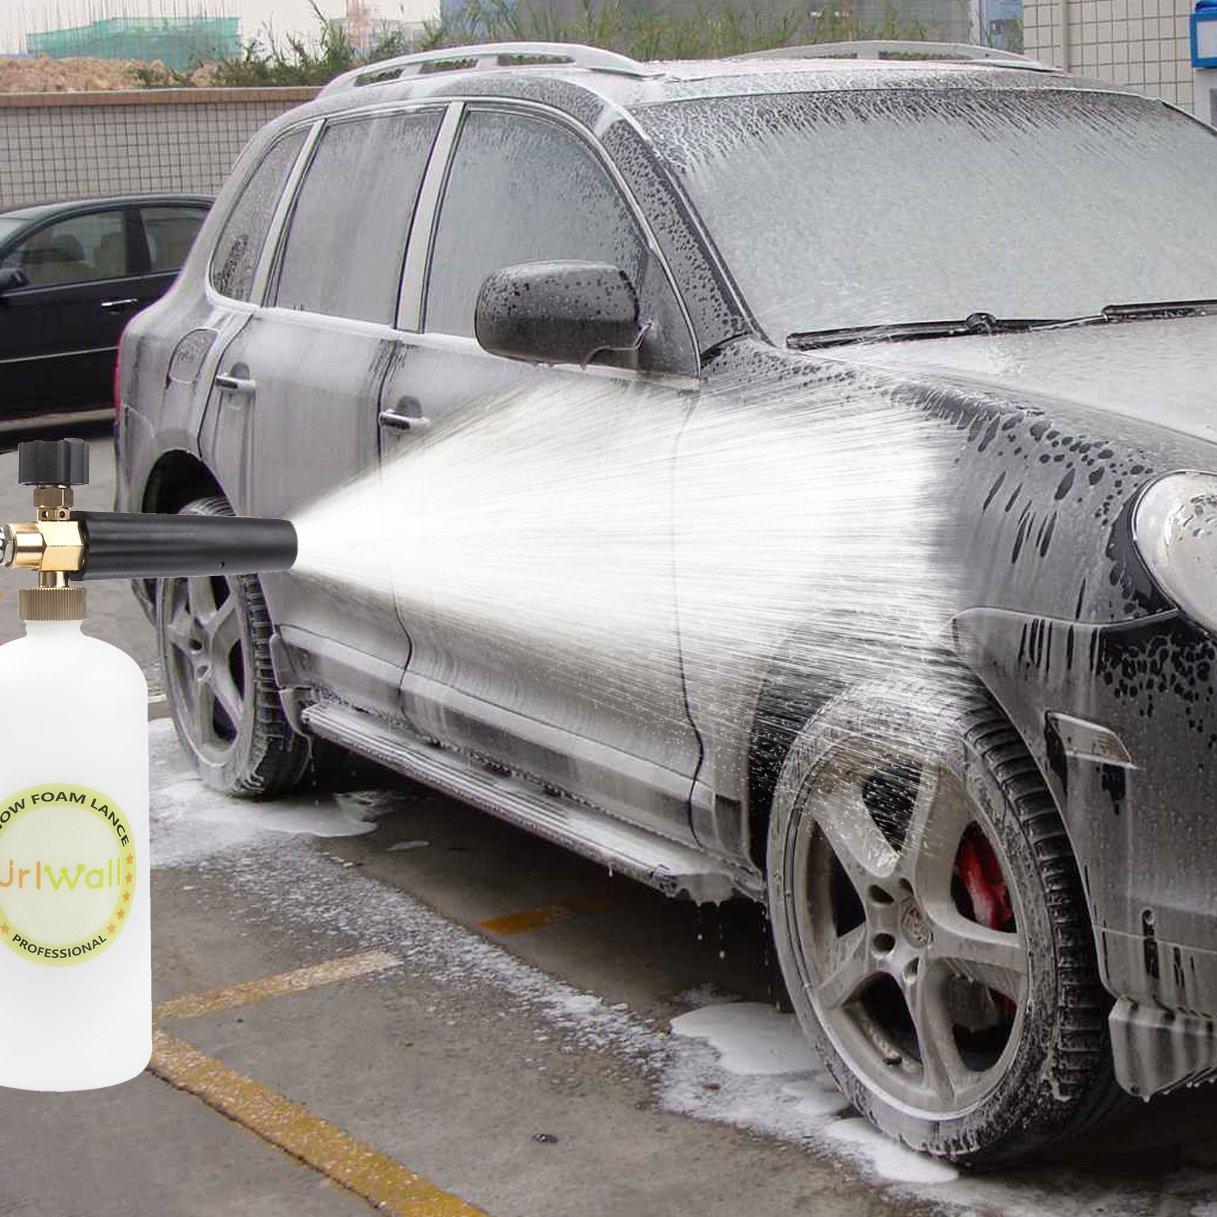 Adjustable Foam Cannon, URLWALL 1 Liter Car Wash Pressure Bottle Snow Foam Lance With 1/4 Quick Connector Foam Blaster for Pressure Washer Gun by URLWALL (Image #6)